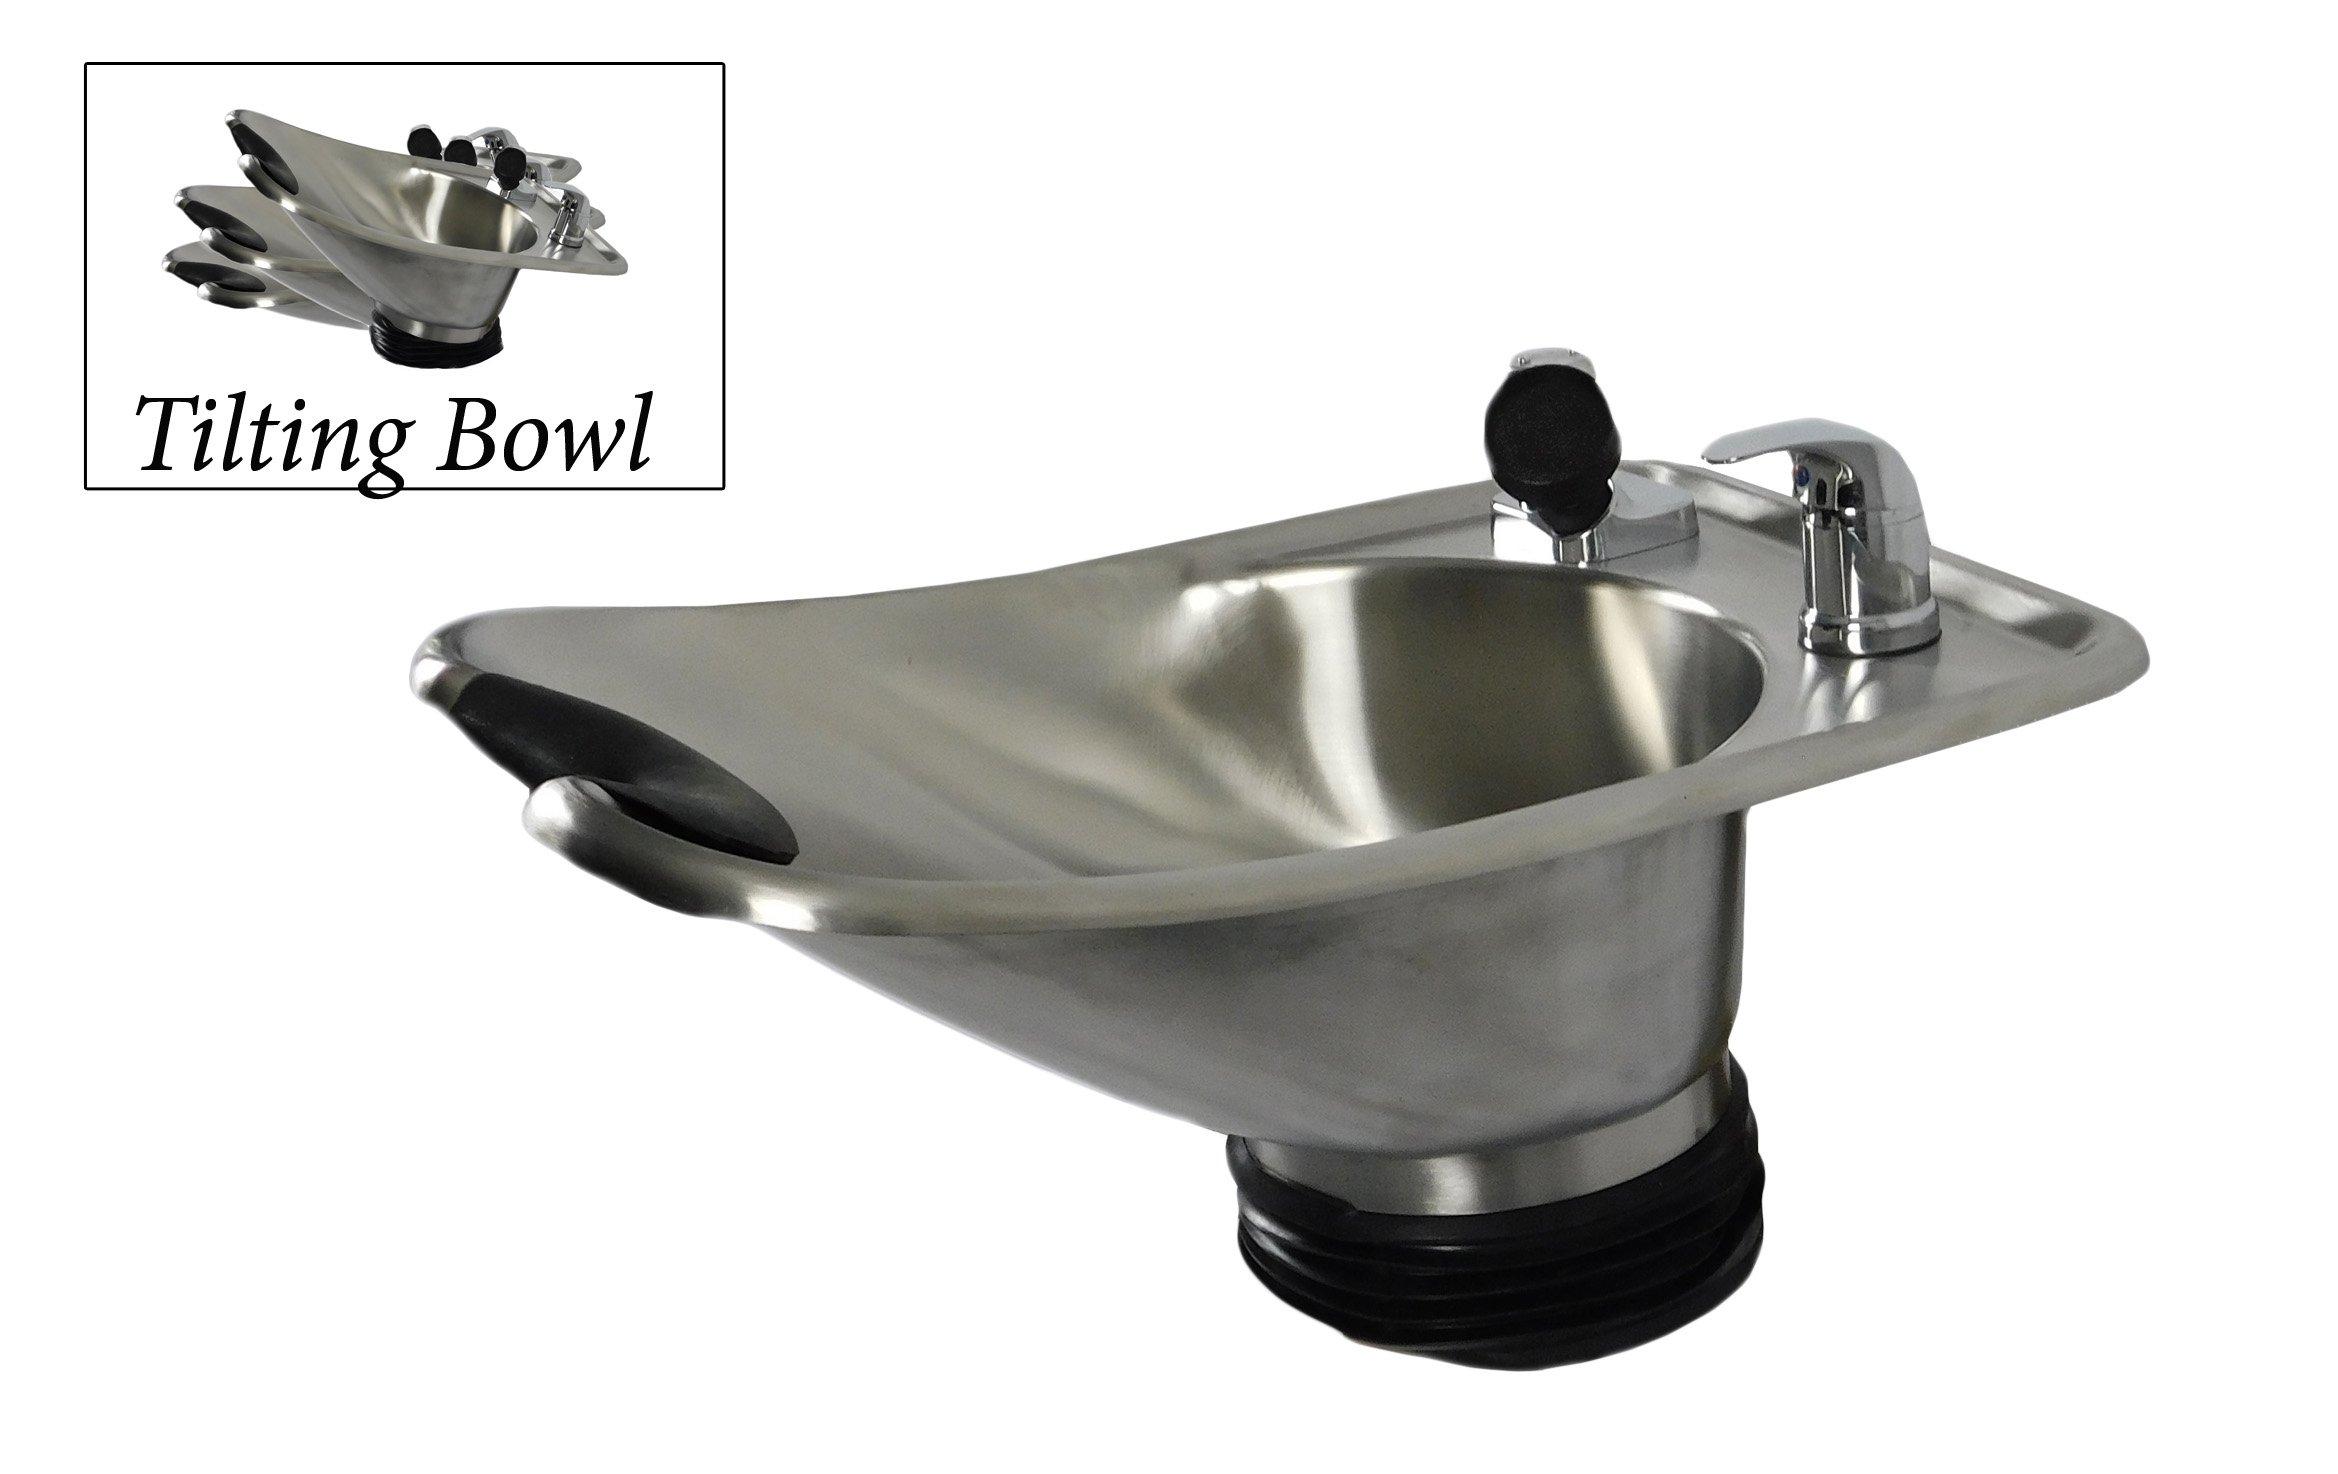 Beauty Salon Shampoo Brushed Stainless Steel Tilt Bowl Wall Mounted Salon Equipment TLC-1567WT